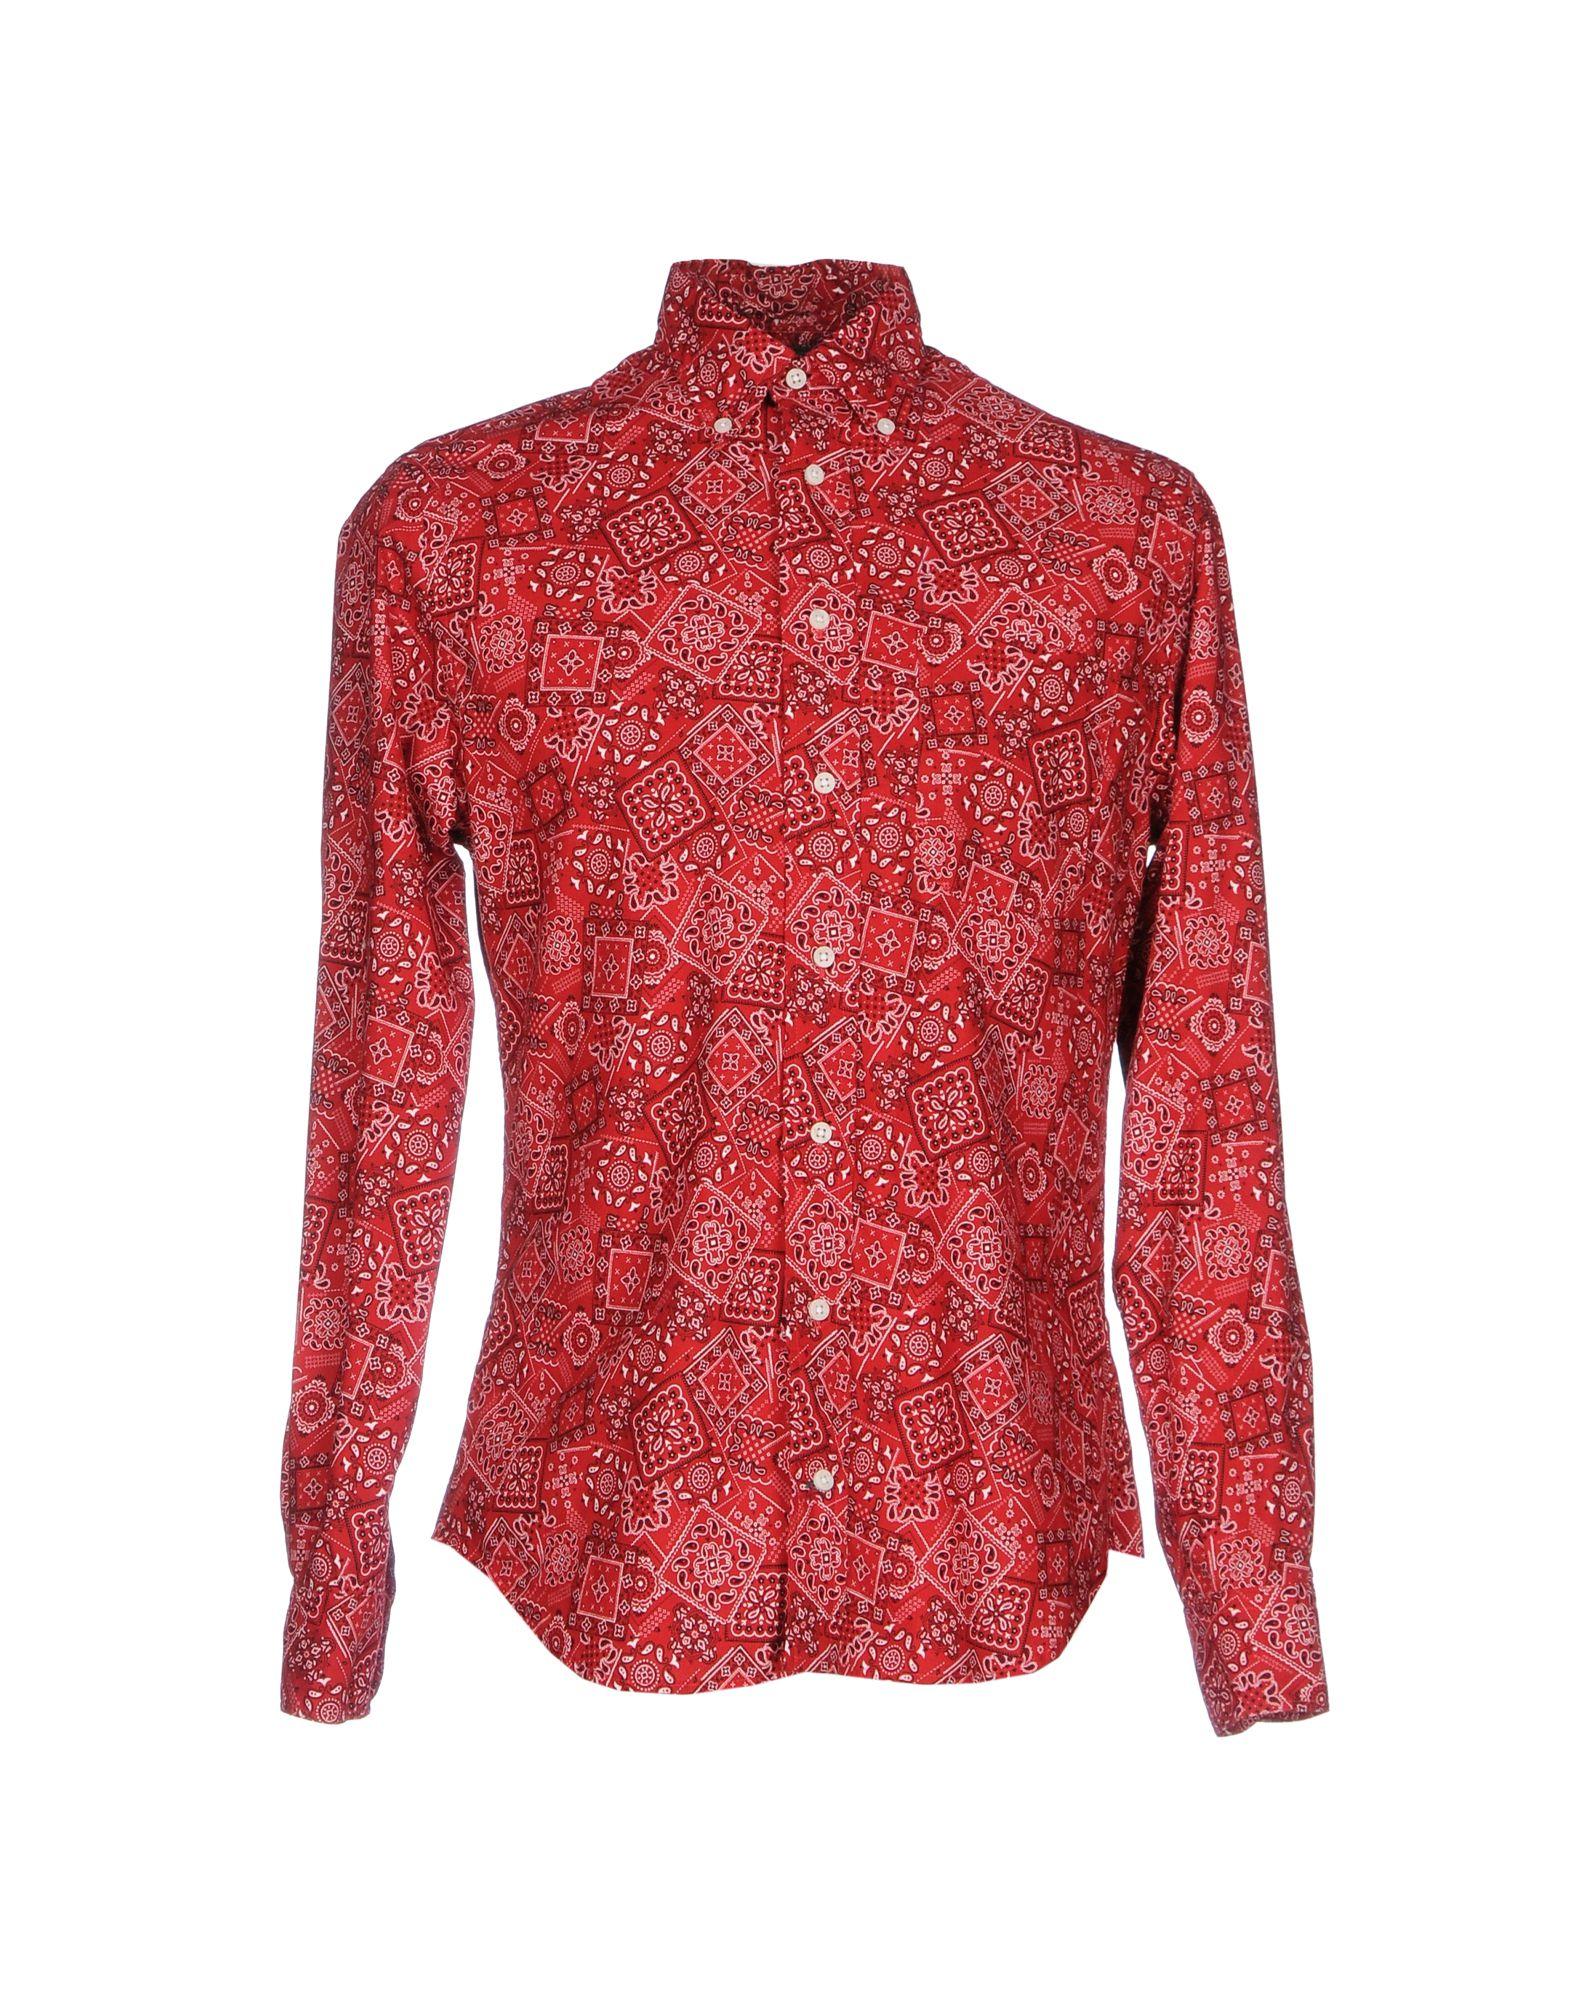 GITMAN BROS. Vintage Herren Hemd Farbe Rot Größe 5